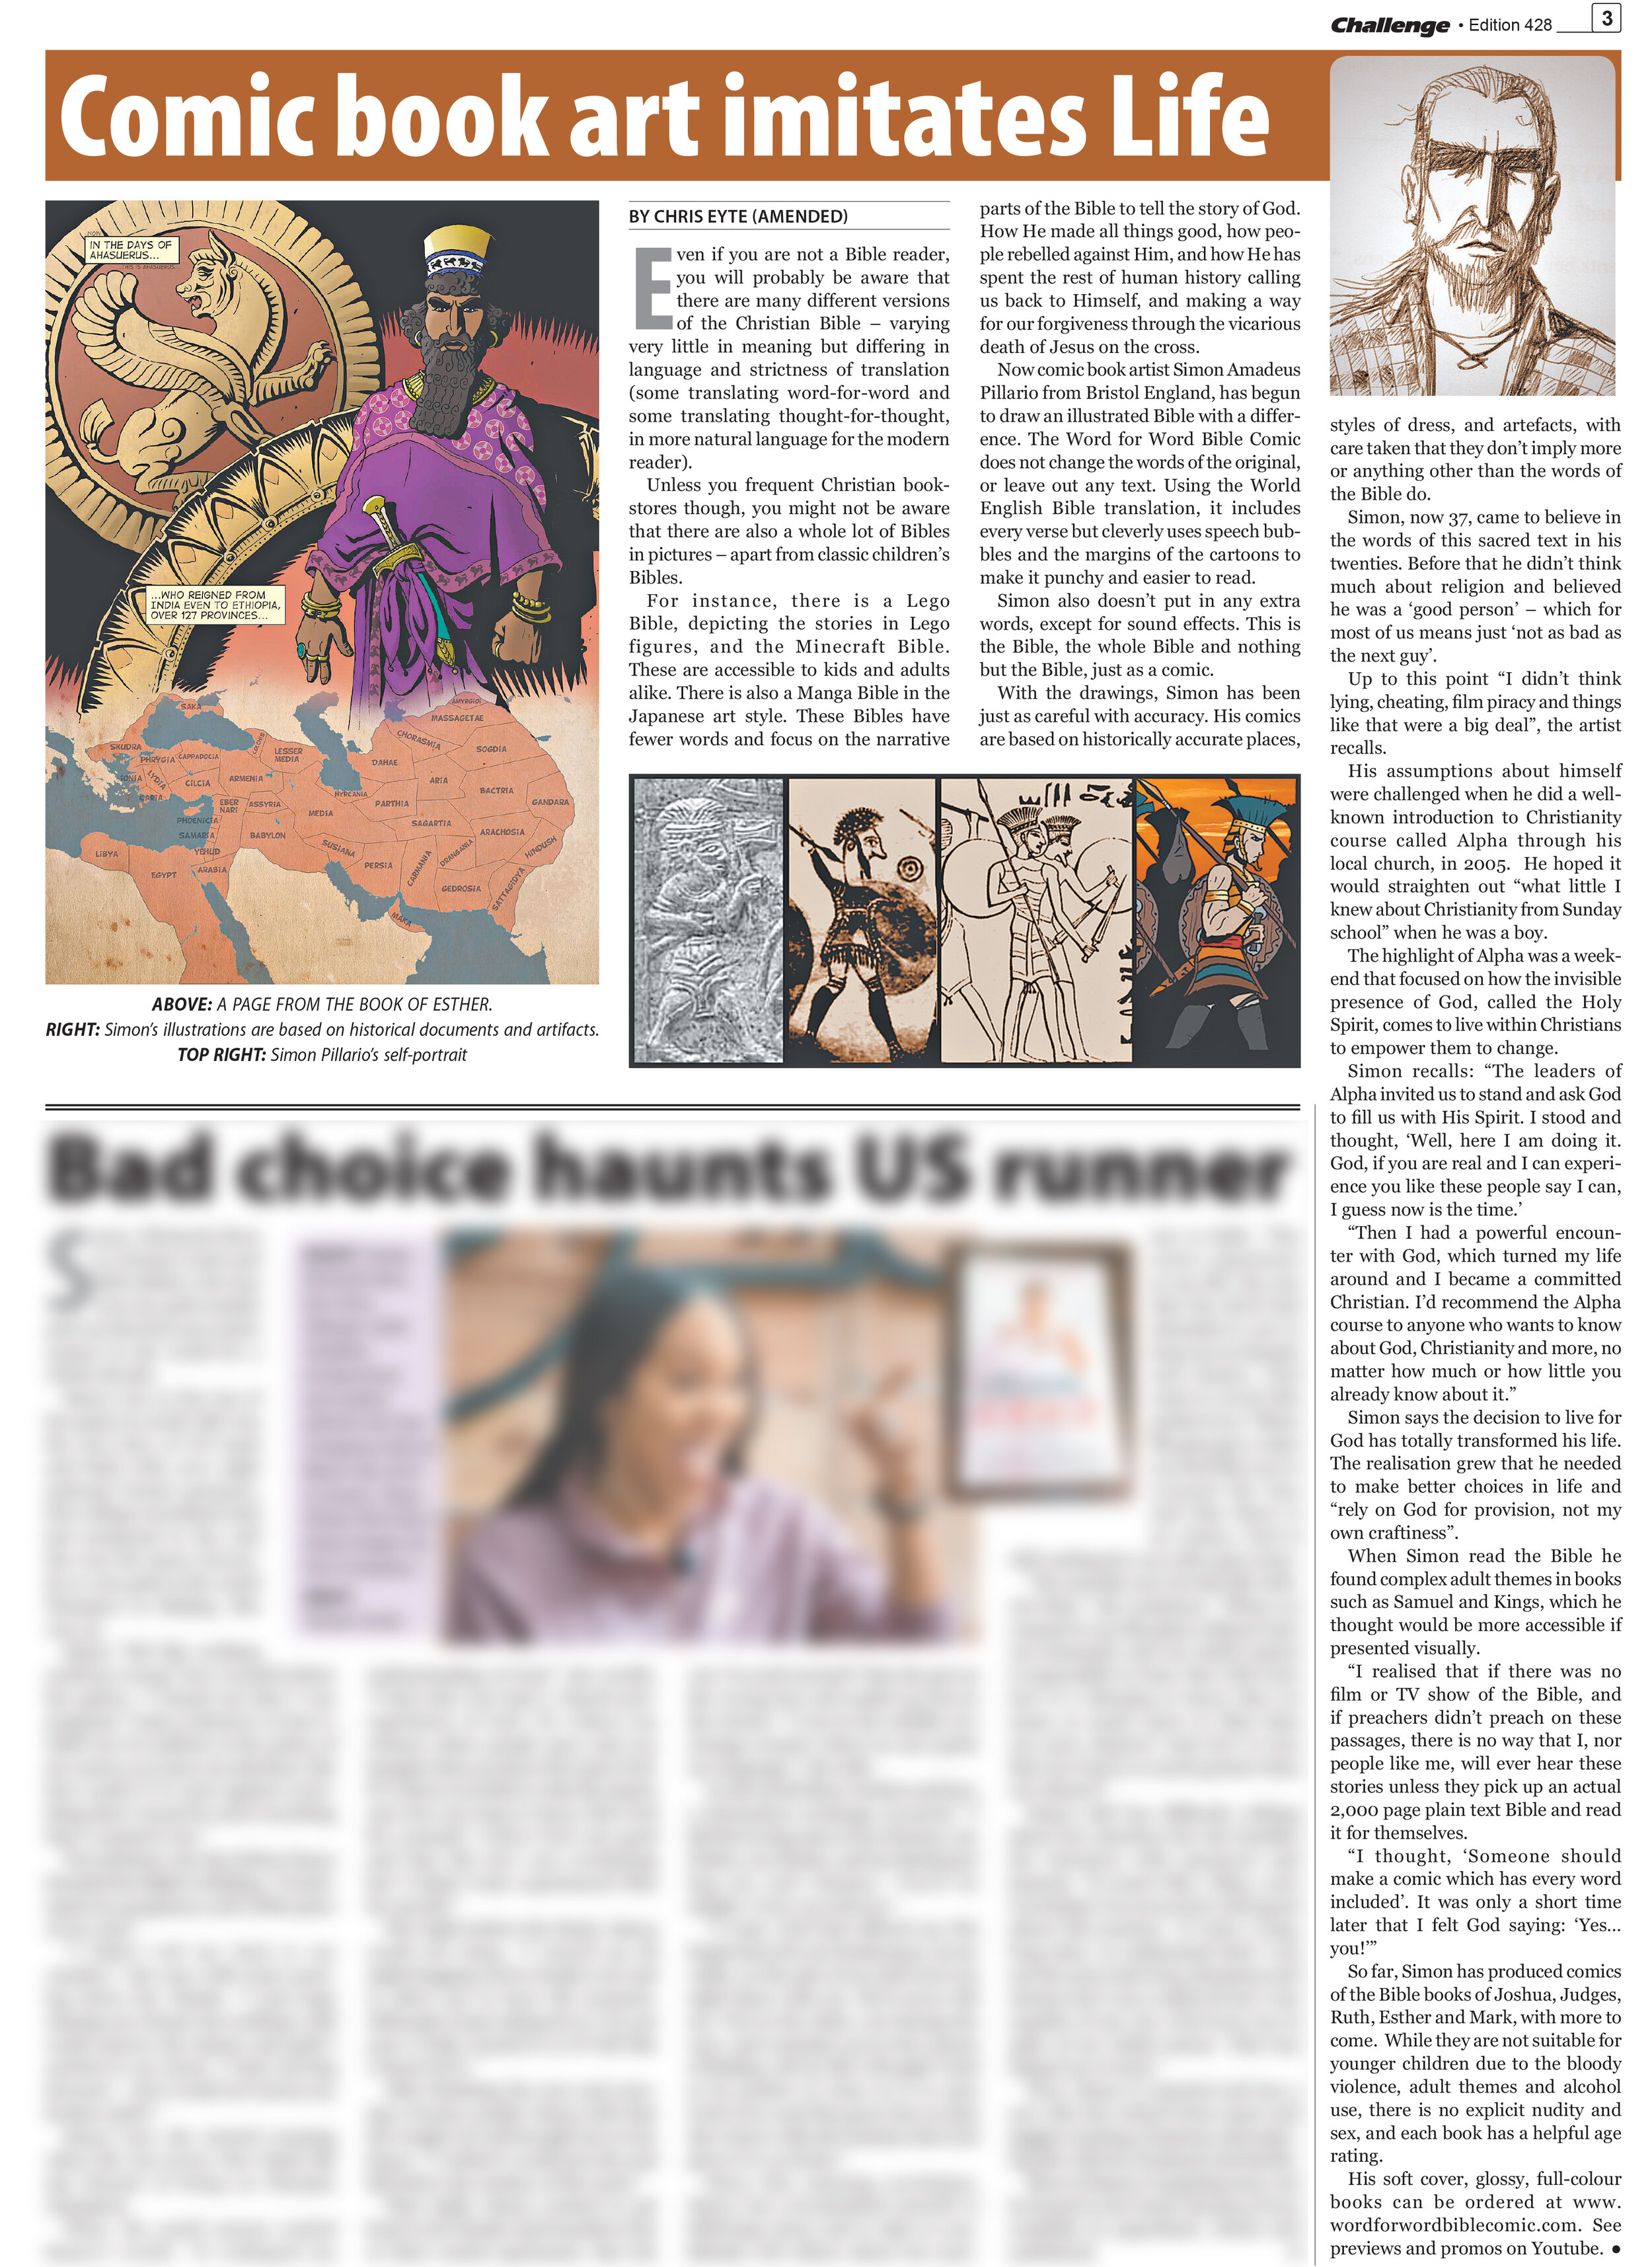 Challenge news paper article.jpg